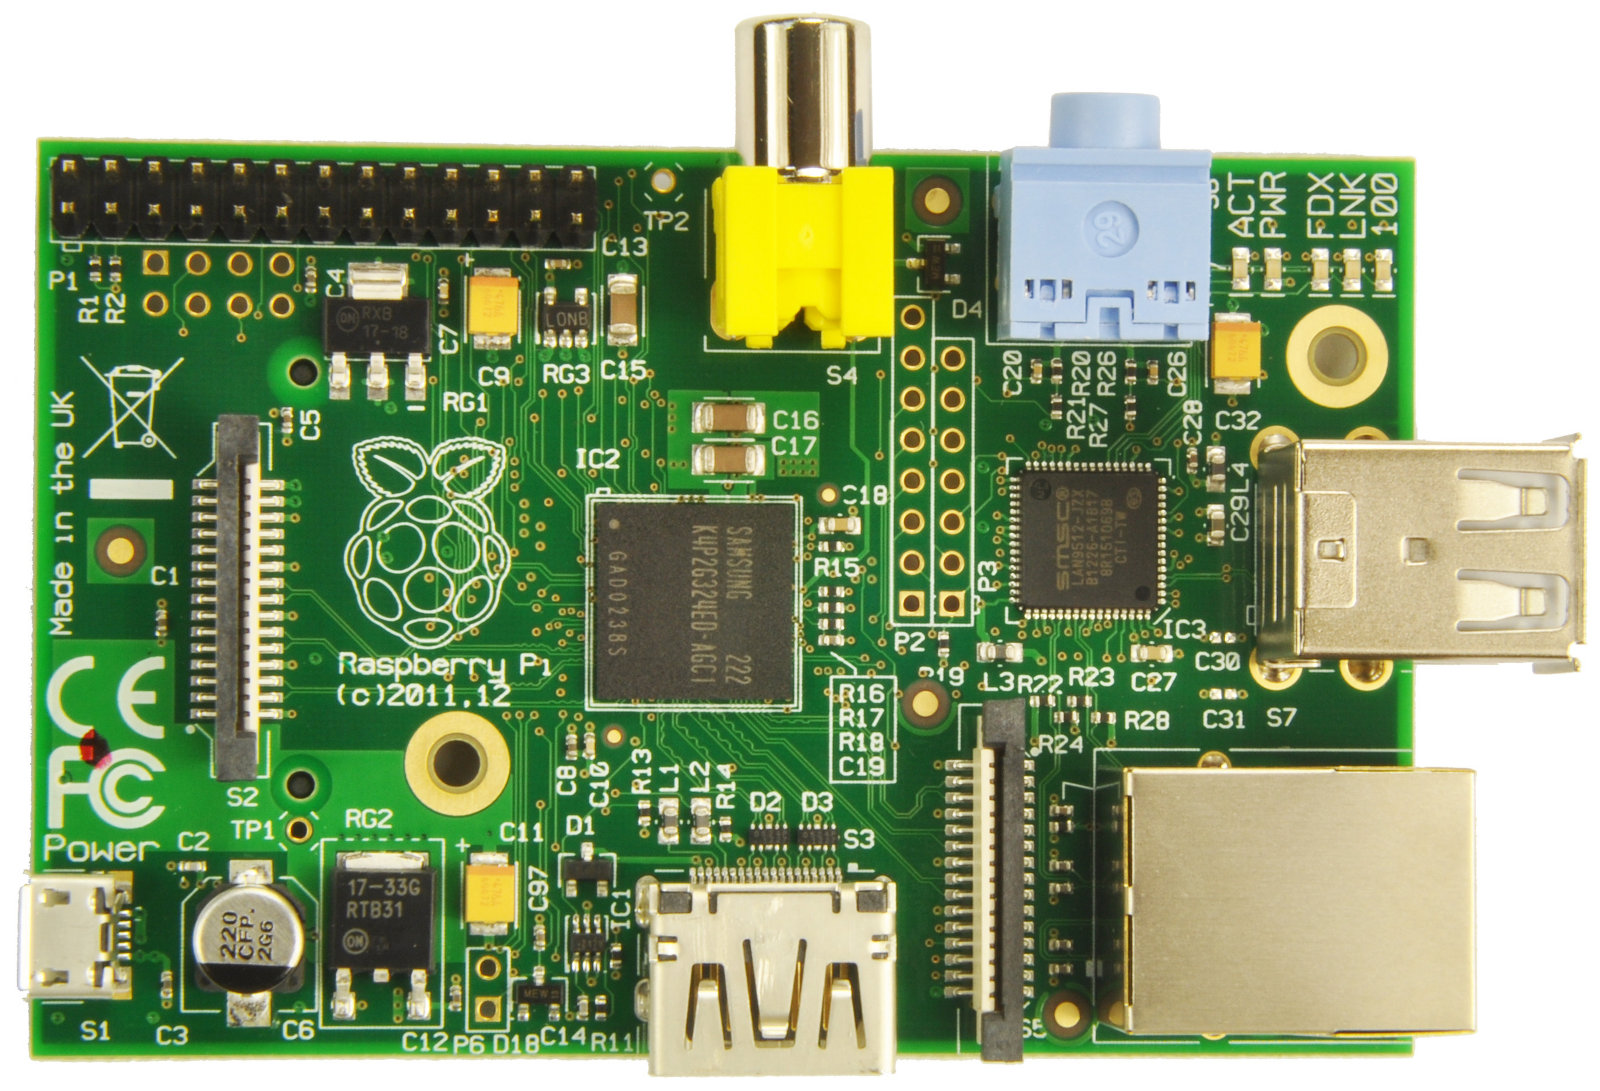 raspberry-pi-2011-12-arm-board_e041ffb858d0a3b7b064d32c150c7aae